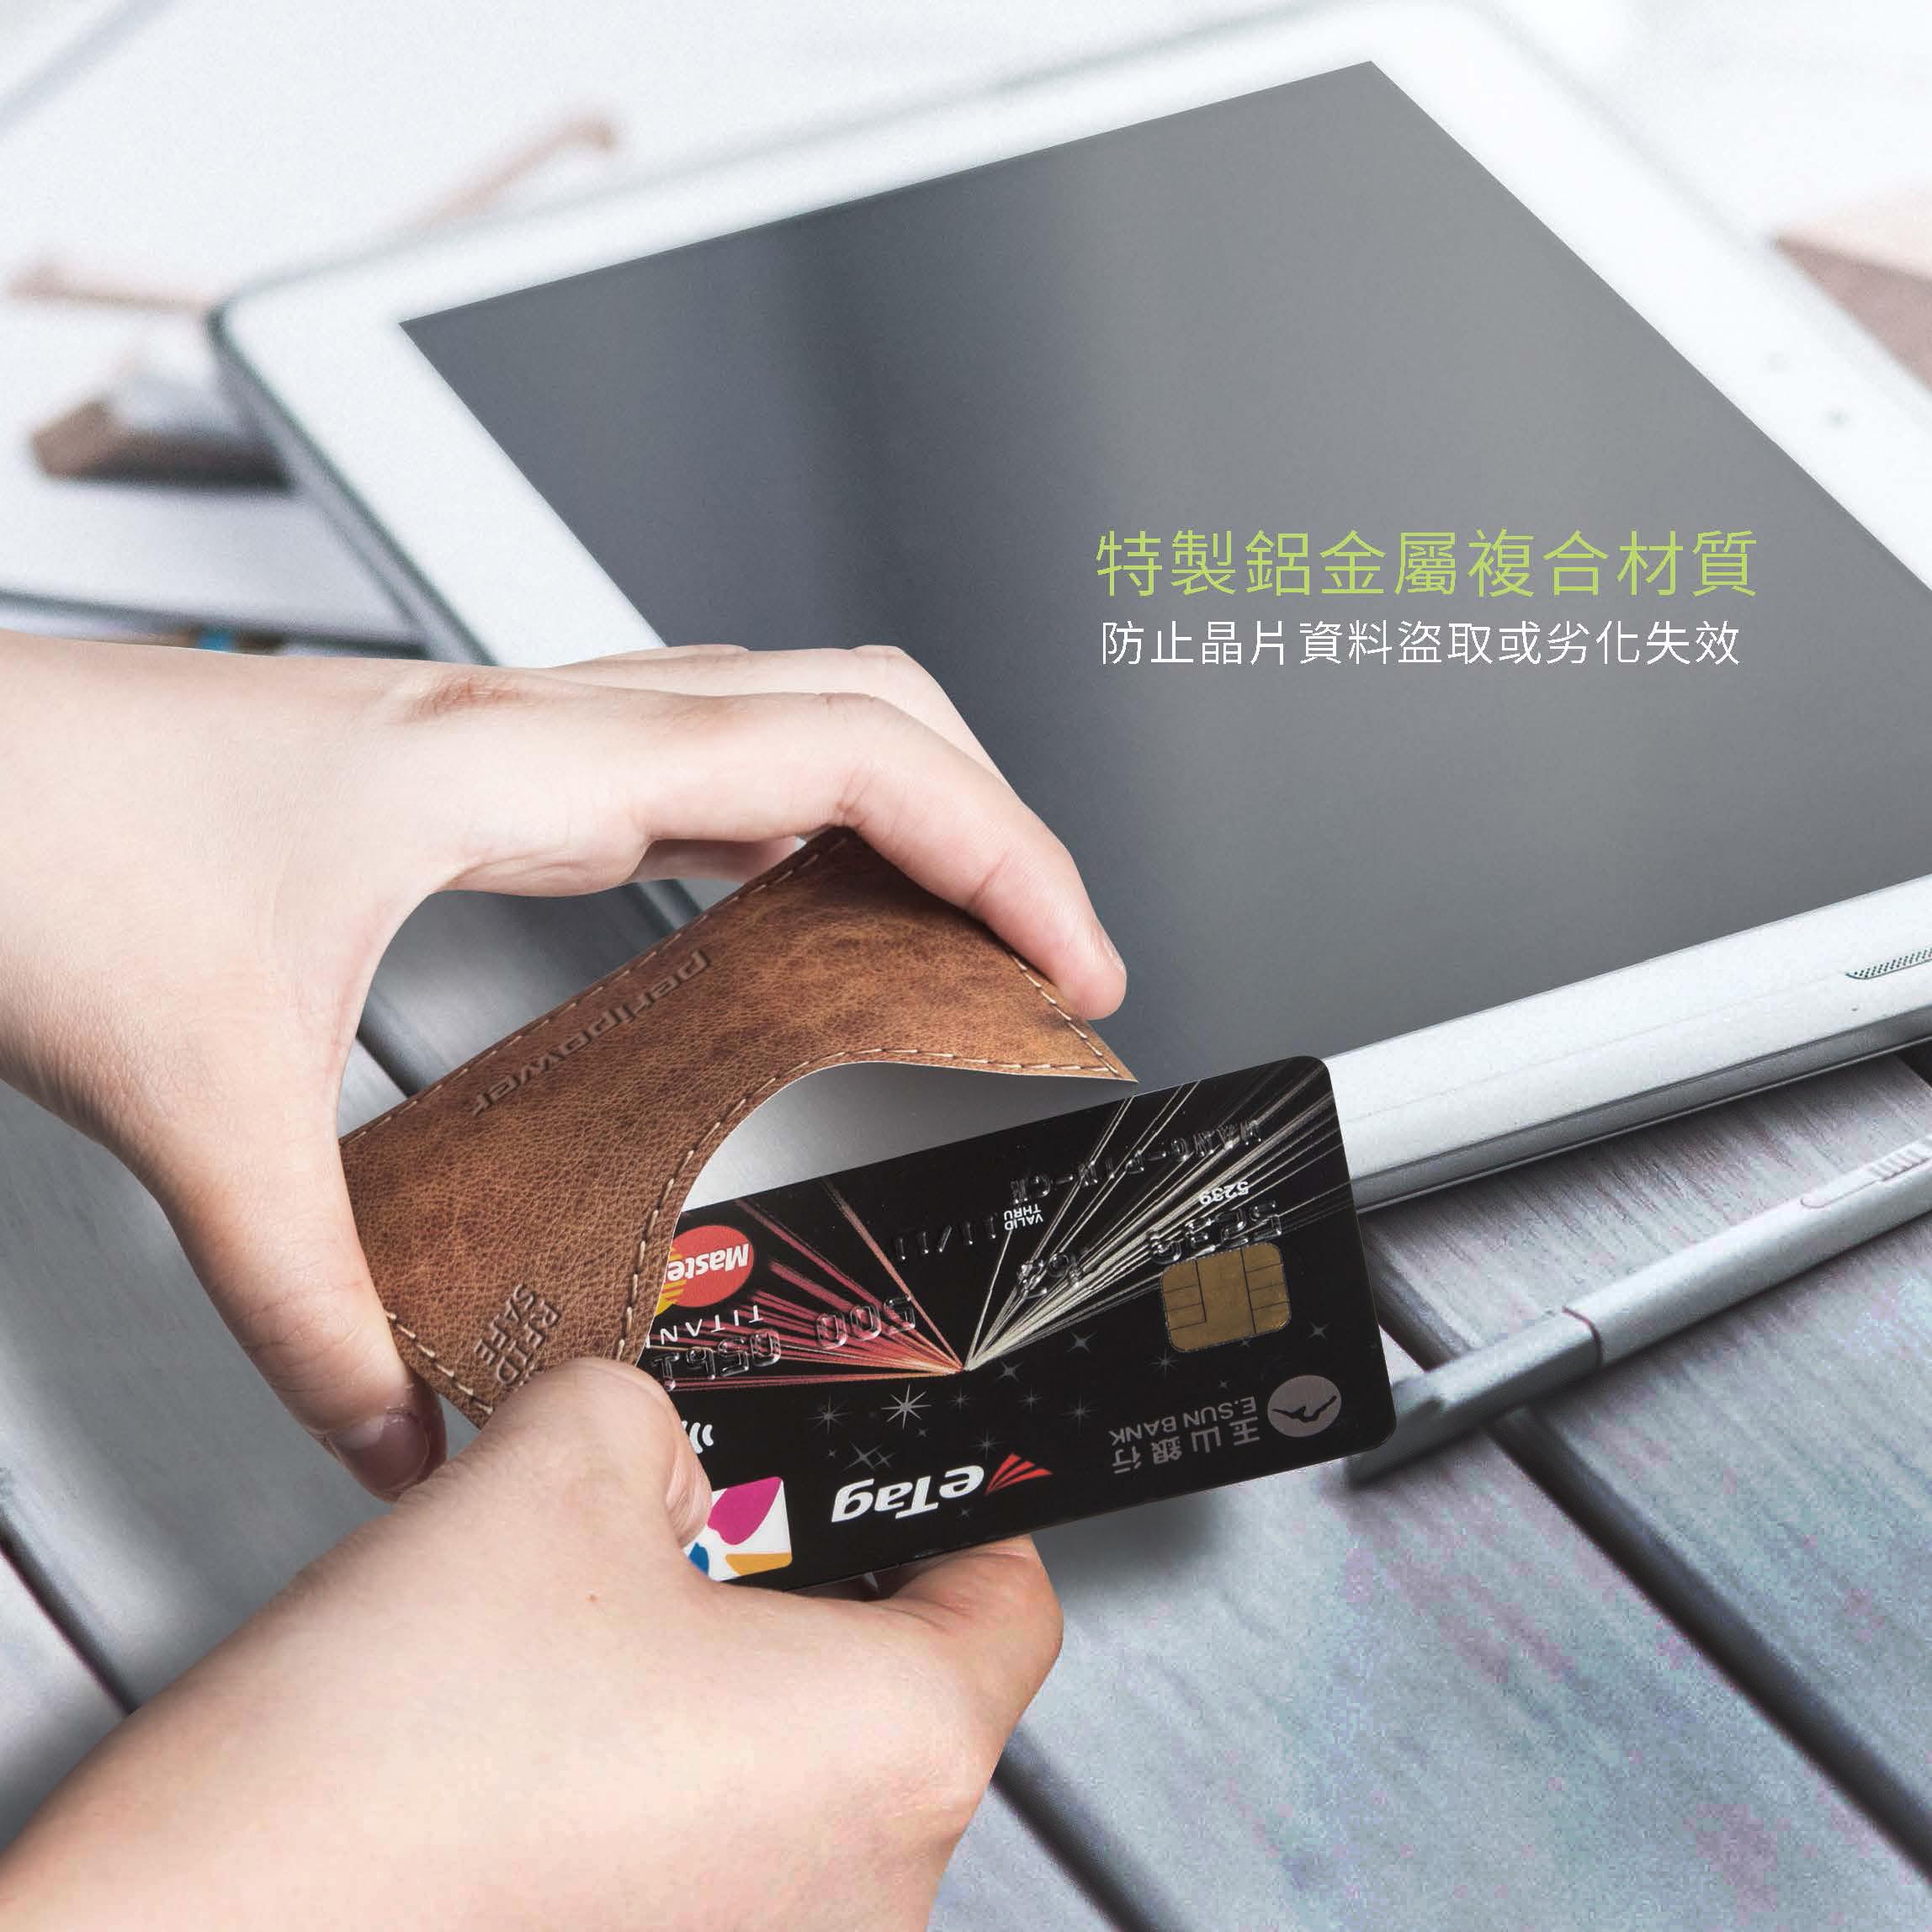 RFID卡安心防護套頁面製作_v1.0_頁面_2